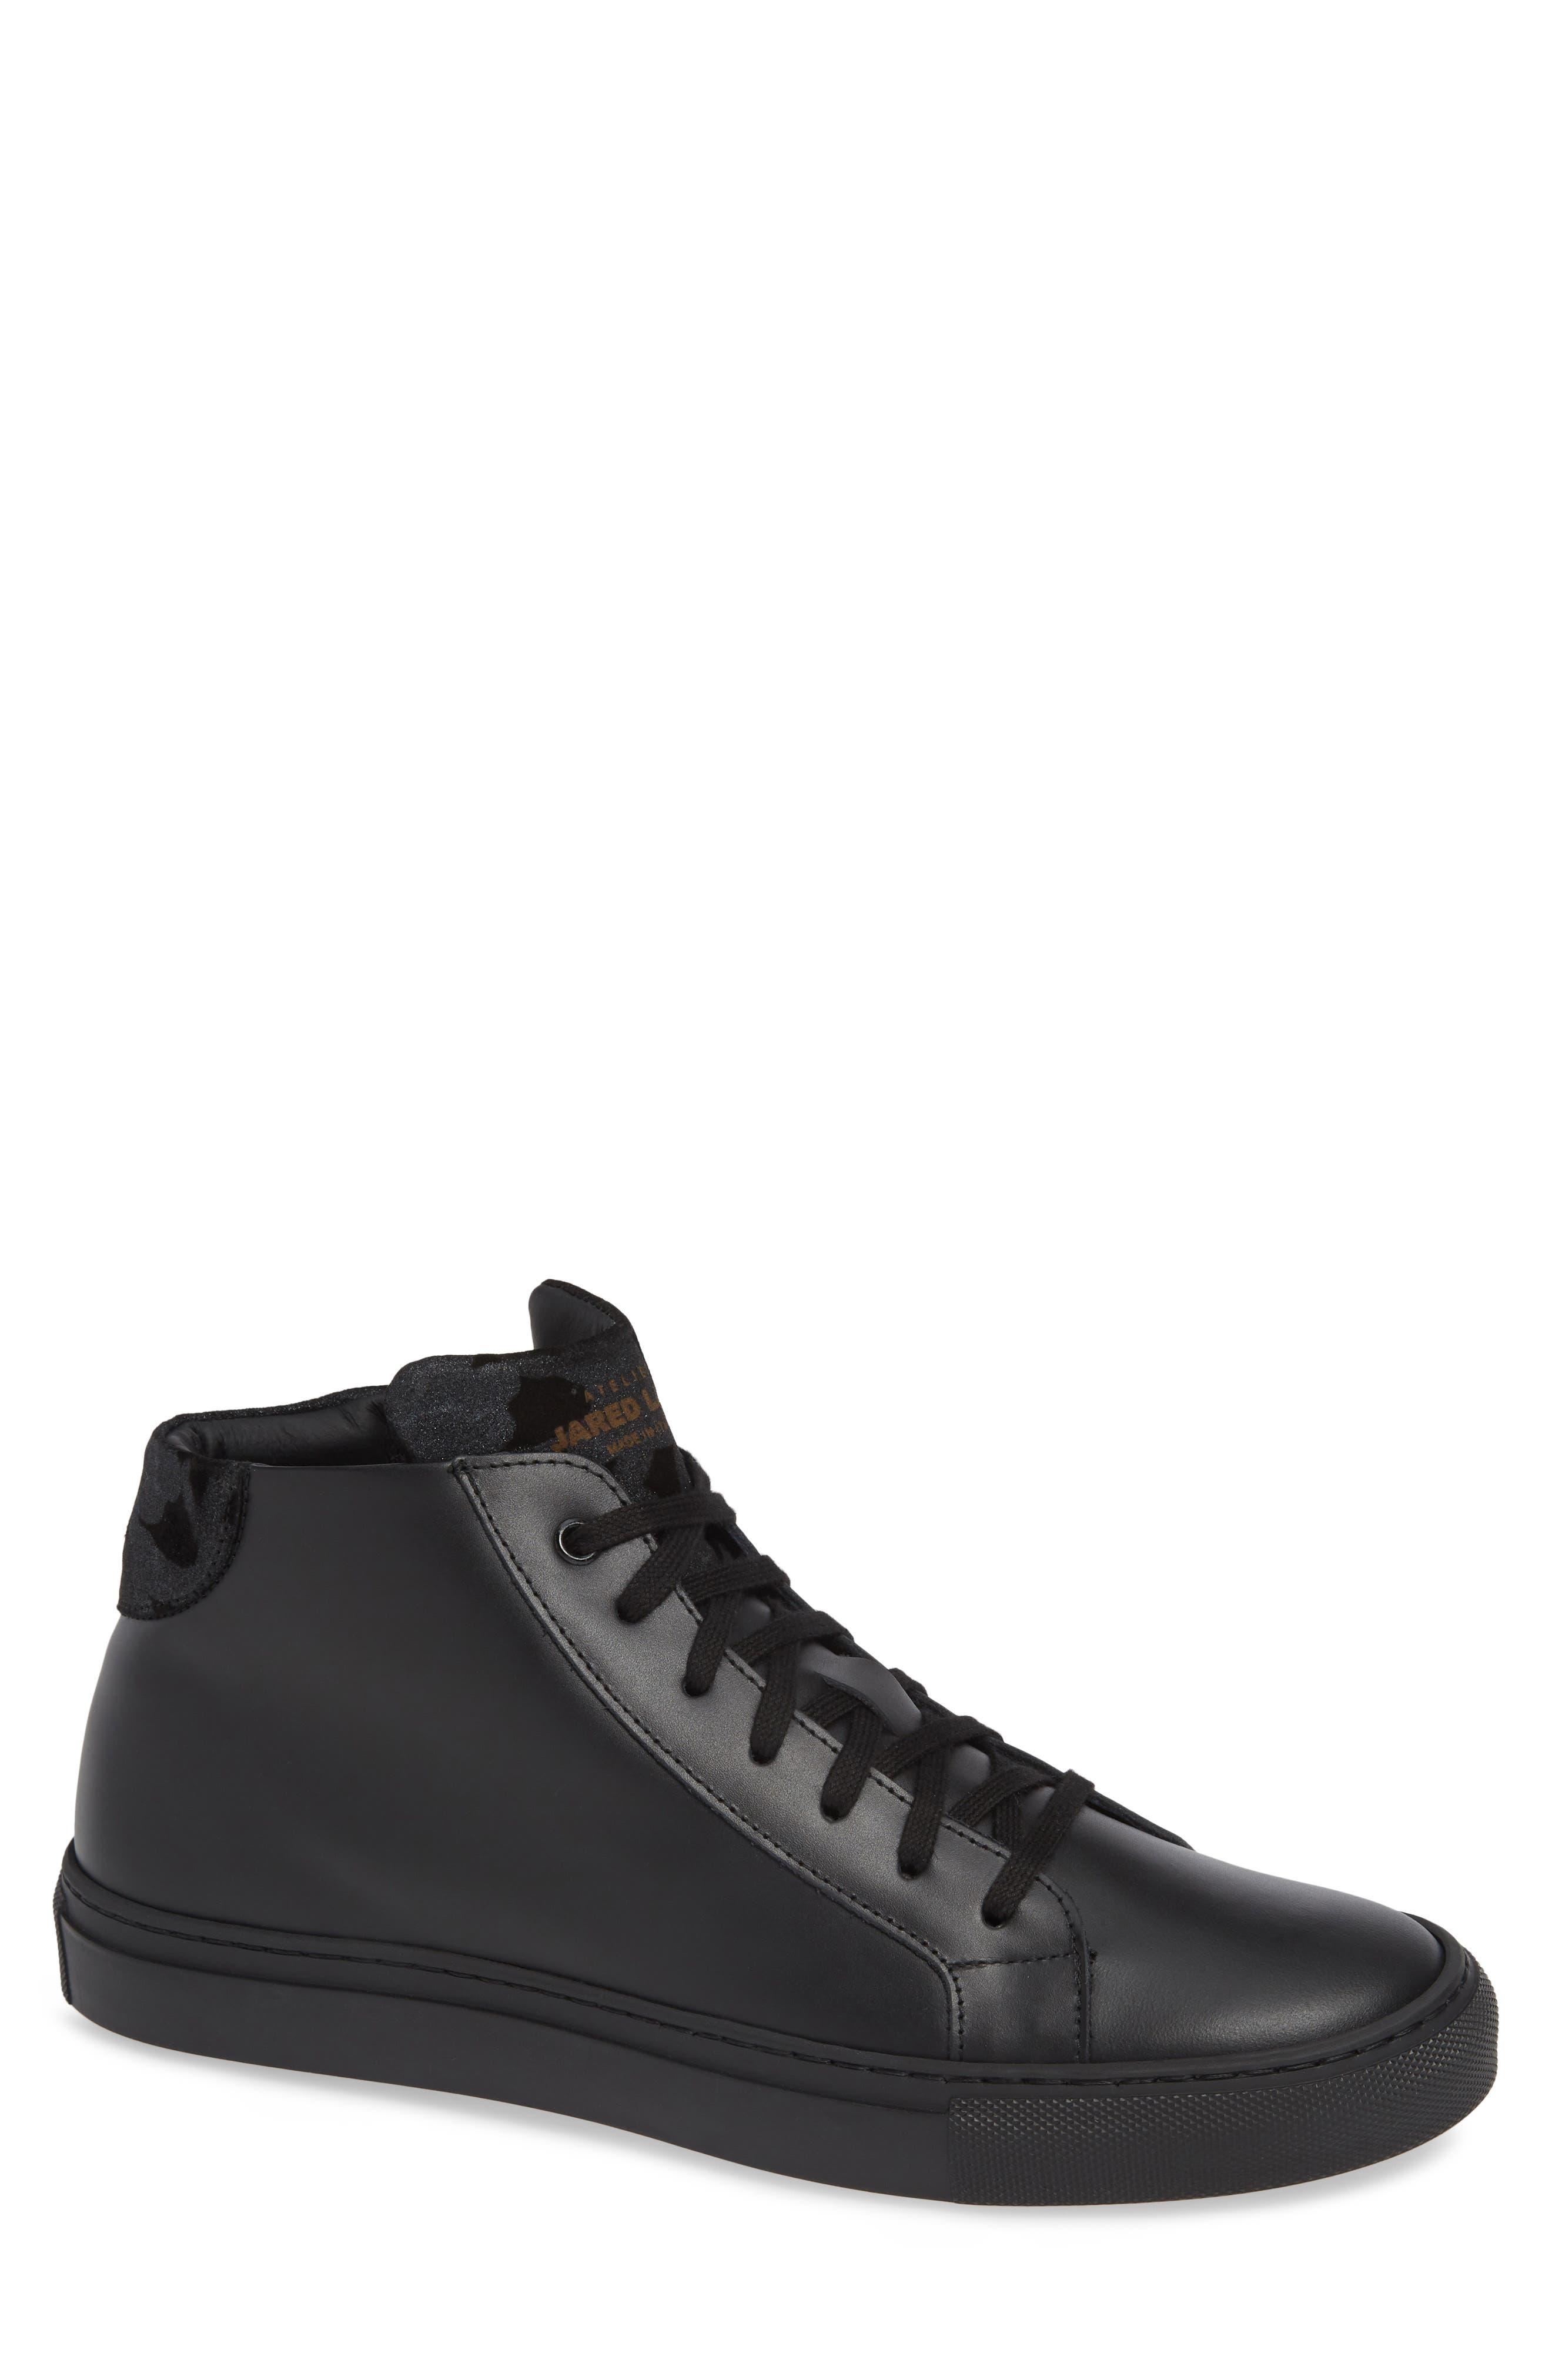 Rome High Top Sneaker,                             Main thumbnail 1, color,                             BLACK